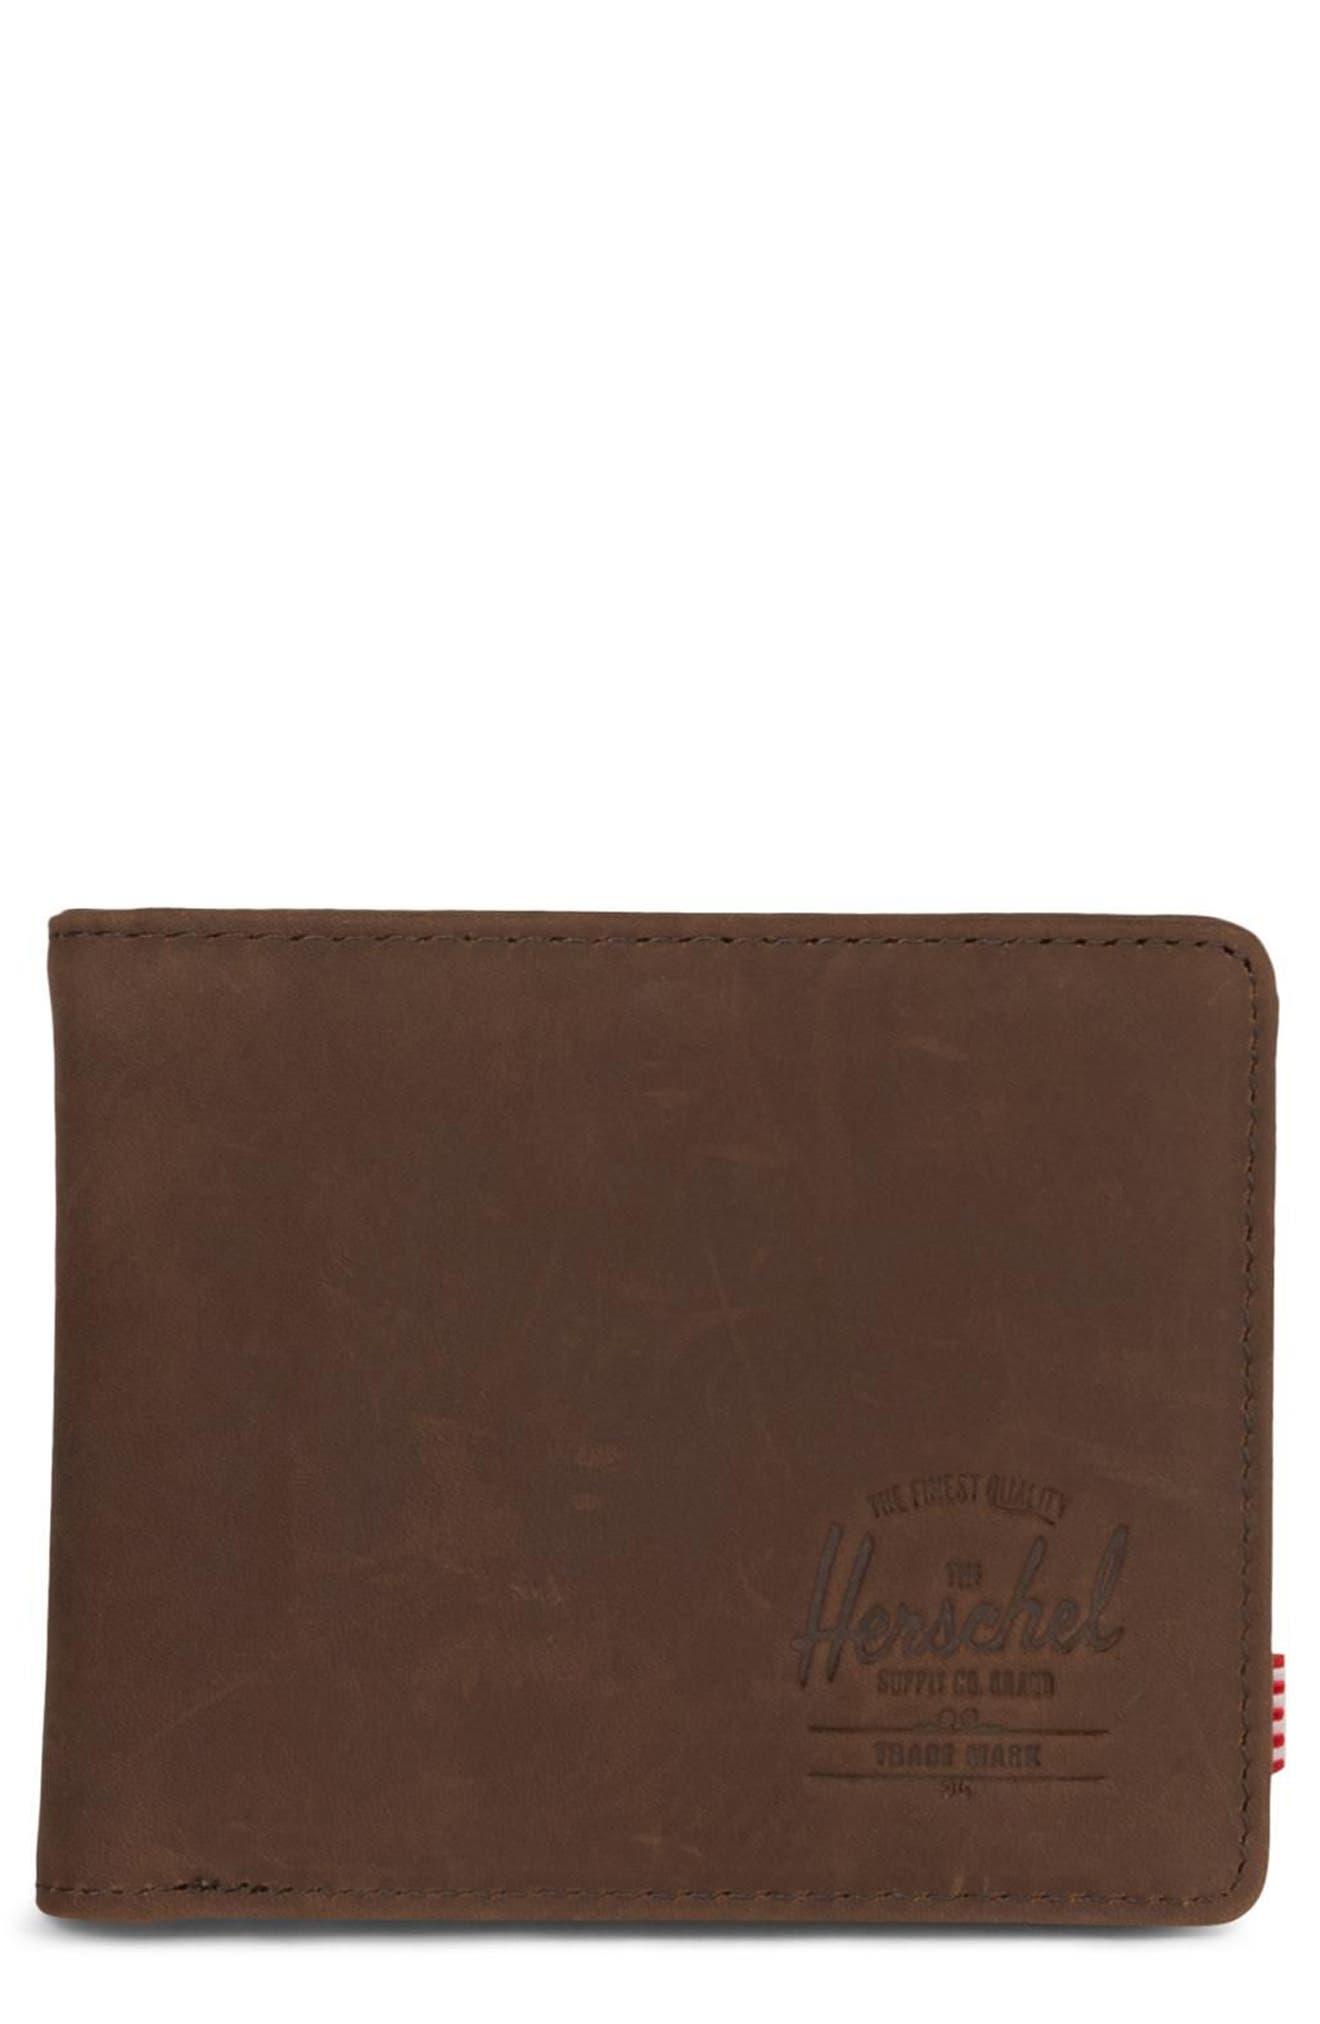 Hank Leather Wallet,                             Main thumbnail 1, color,                             Nubuck Brown